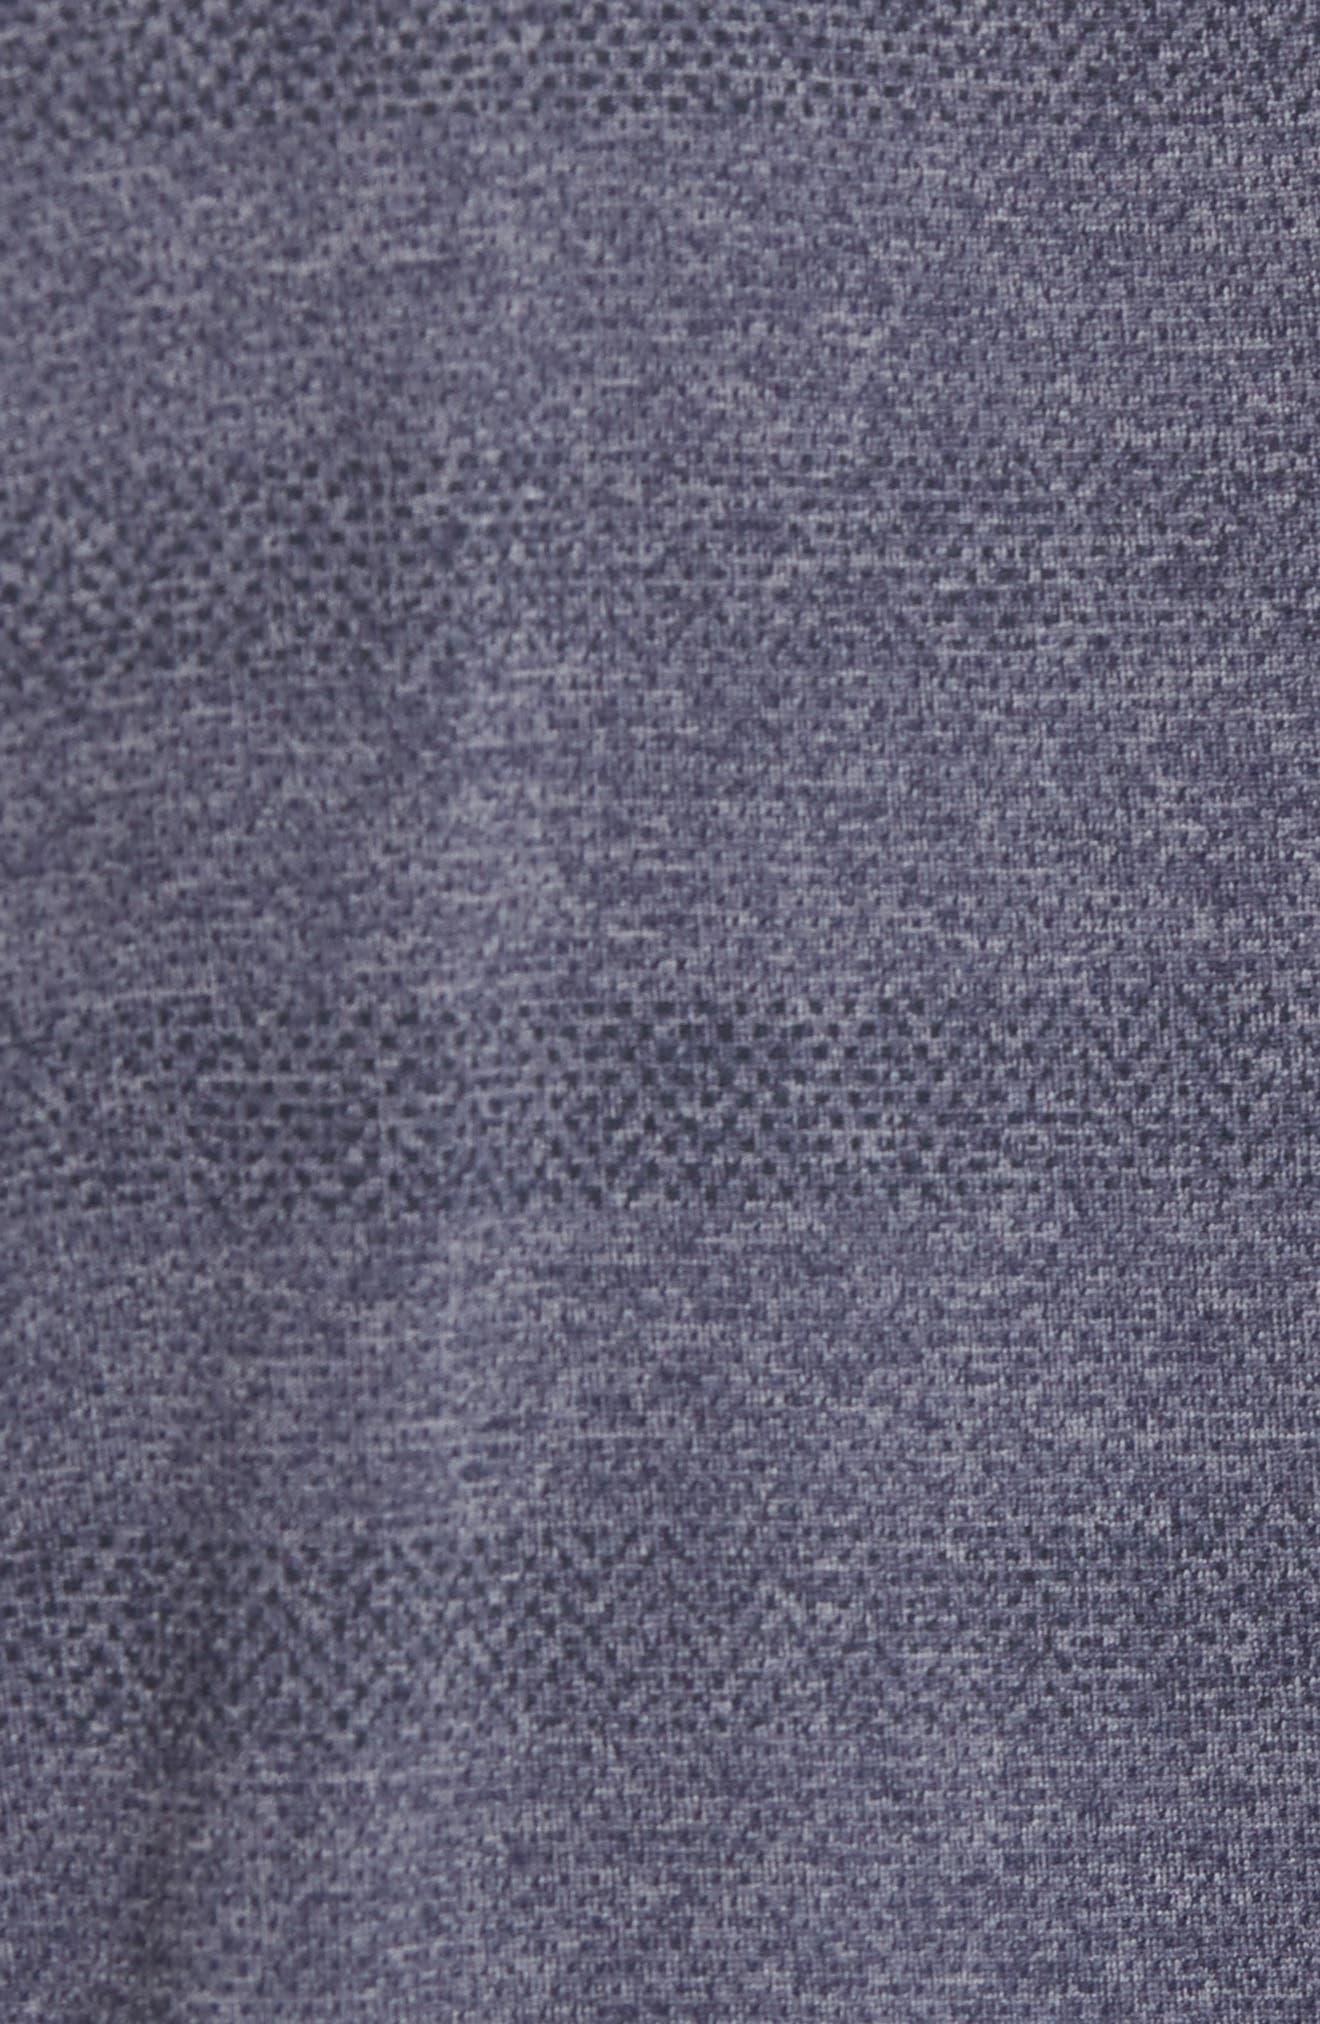 Upshift T-Shirt,                             Alternate thumbnail 5, color,                             HEATHER GRIFFIN